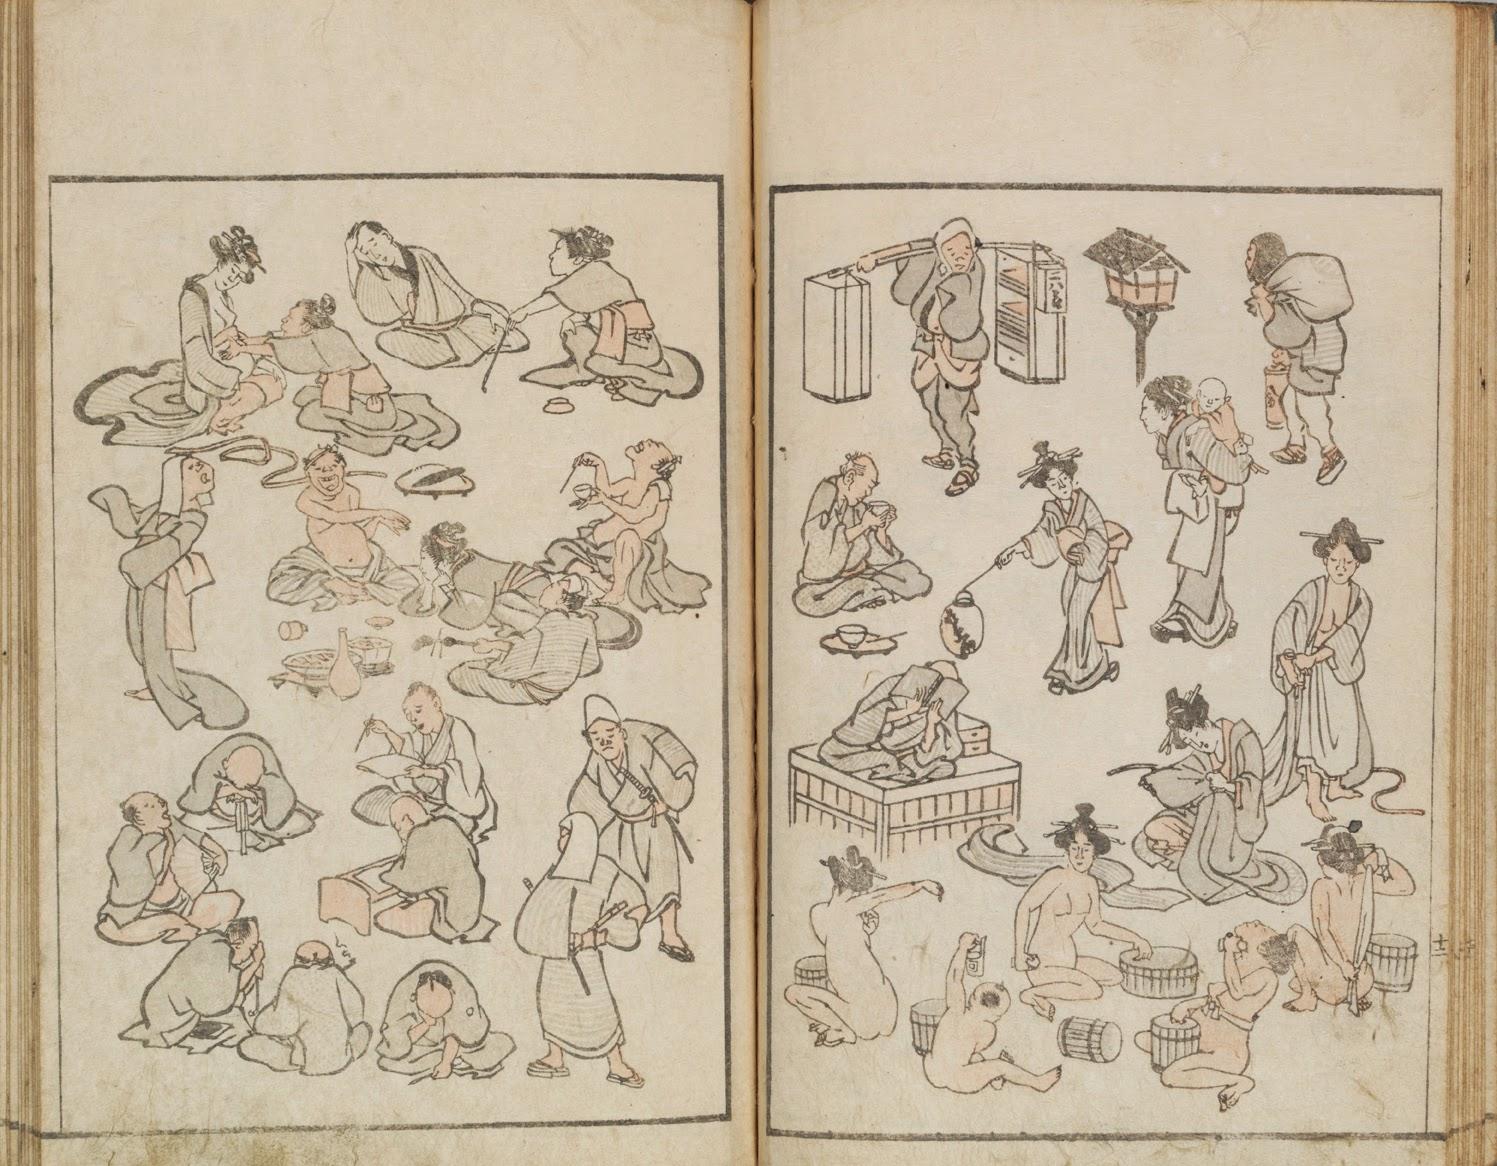 Katsushika Hokusai (1760 -1849) Hokusai Manga. Carnet de croquis divers de Hokusai Hokusai manga Ère Bunka, an XI (janvier 1814) Livre edehon, format hanshibon Signature : Katsushika Hokusai hitsu Sceau : Raishin Éditeur : Eiraku-ya Tōshirō Japon, collection particulière